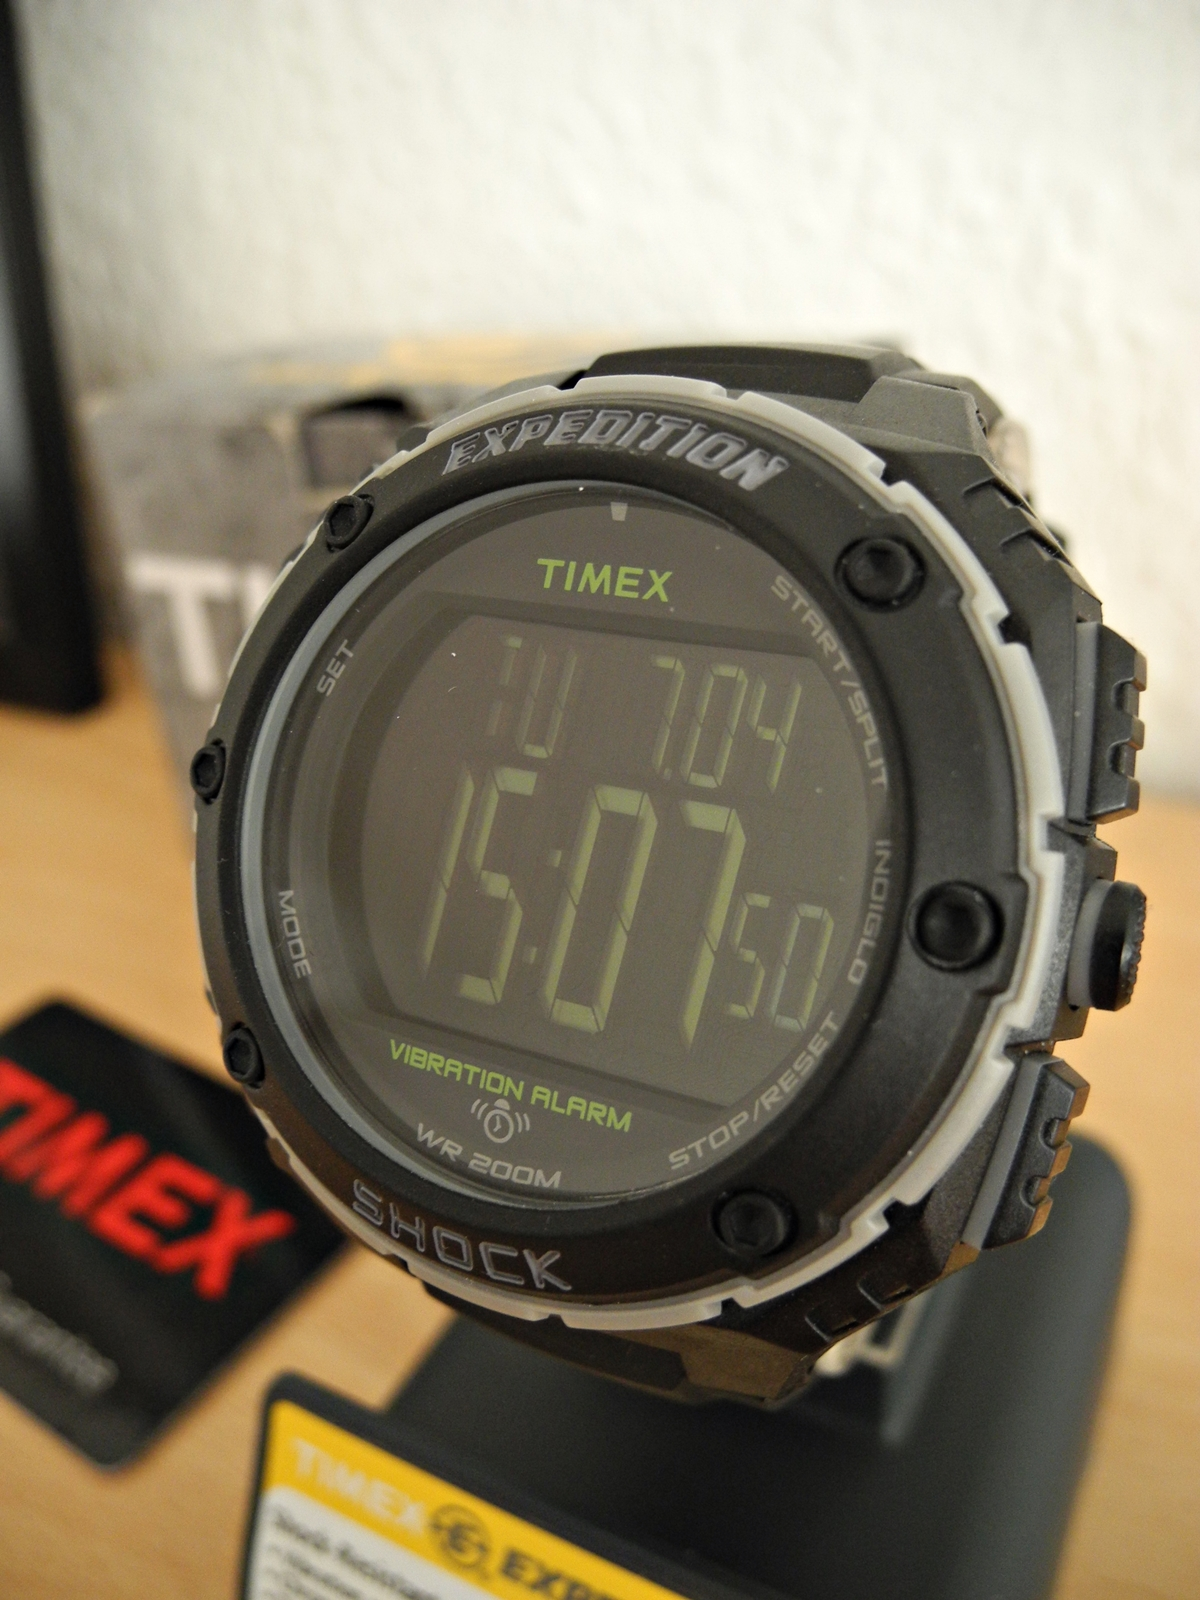 e851f7aef8c Erledigt Timex Expedition Shock T49950 UhrForum